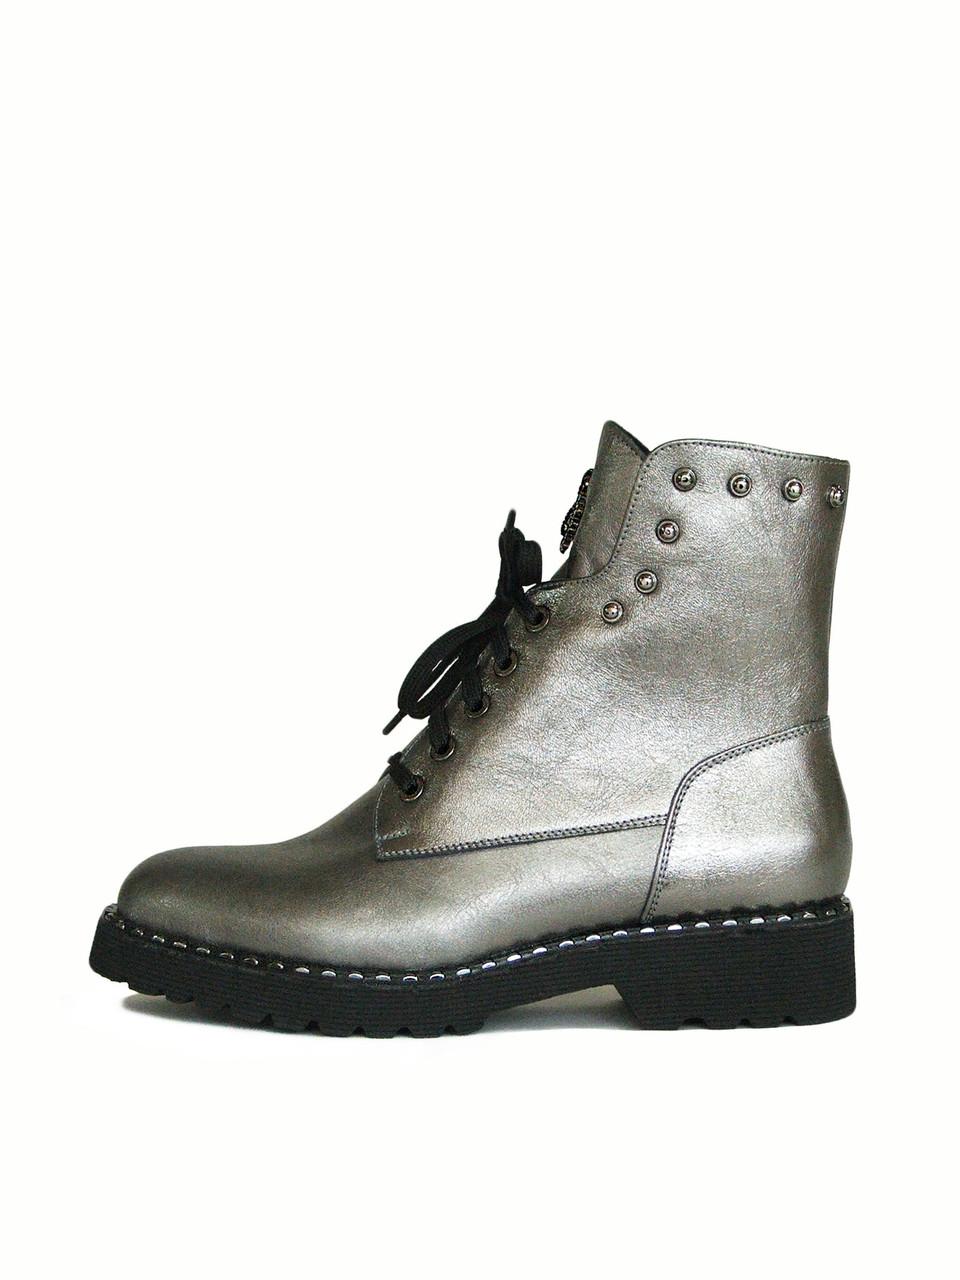 Серебристые женские ботинки на шнуровке